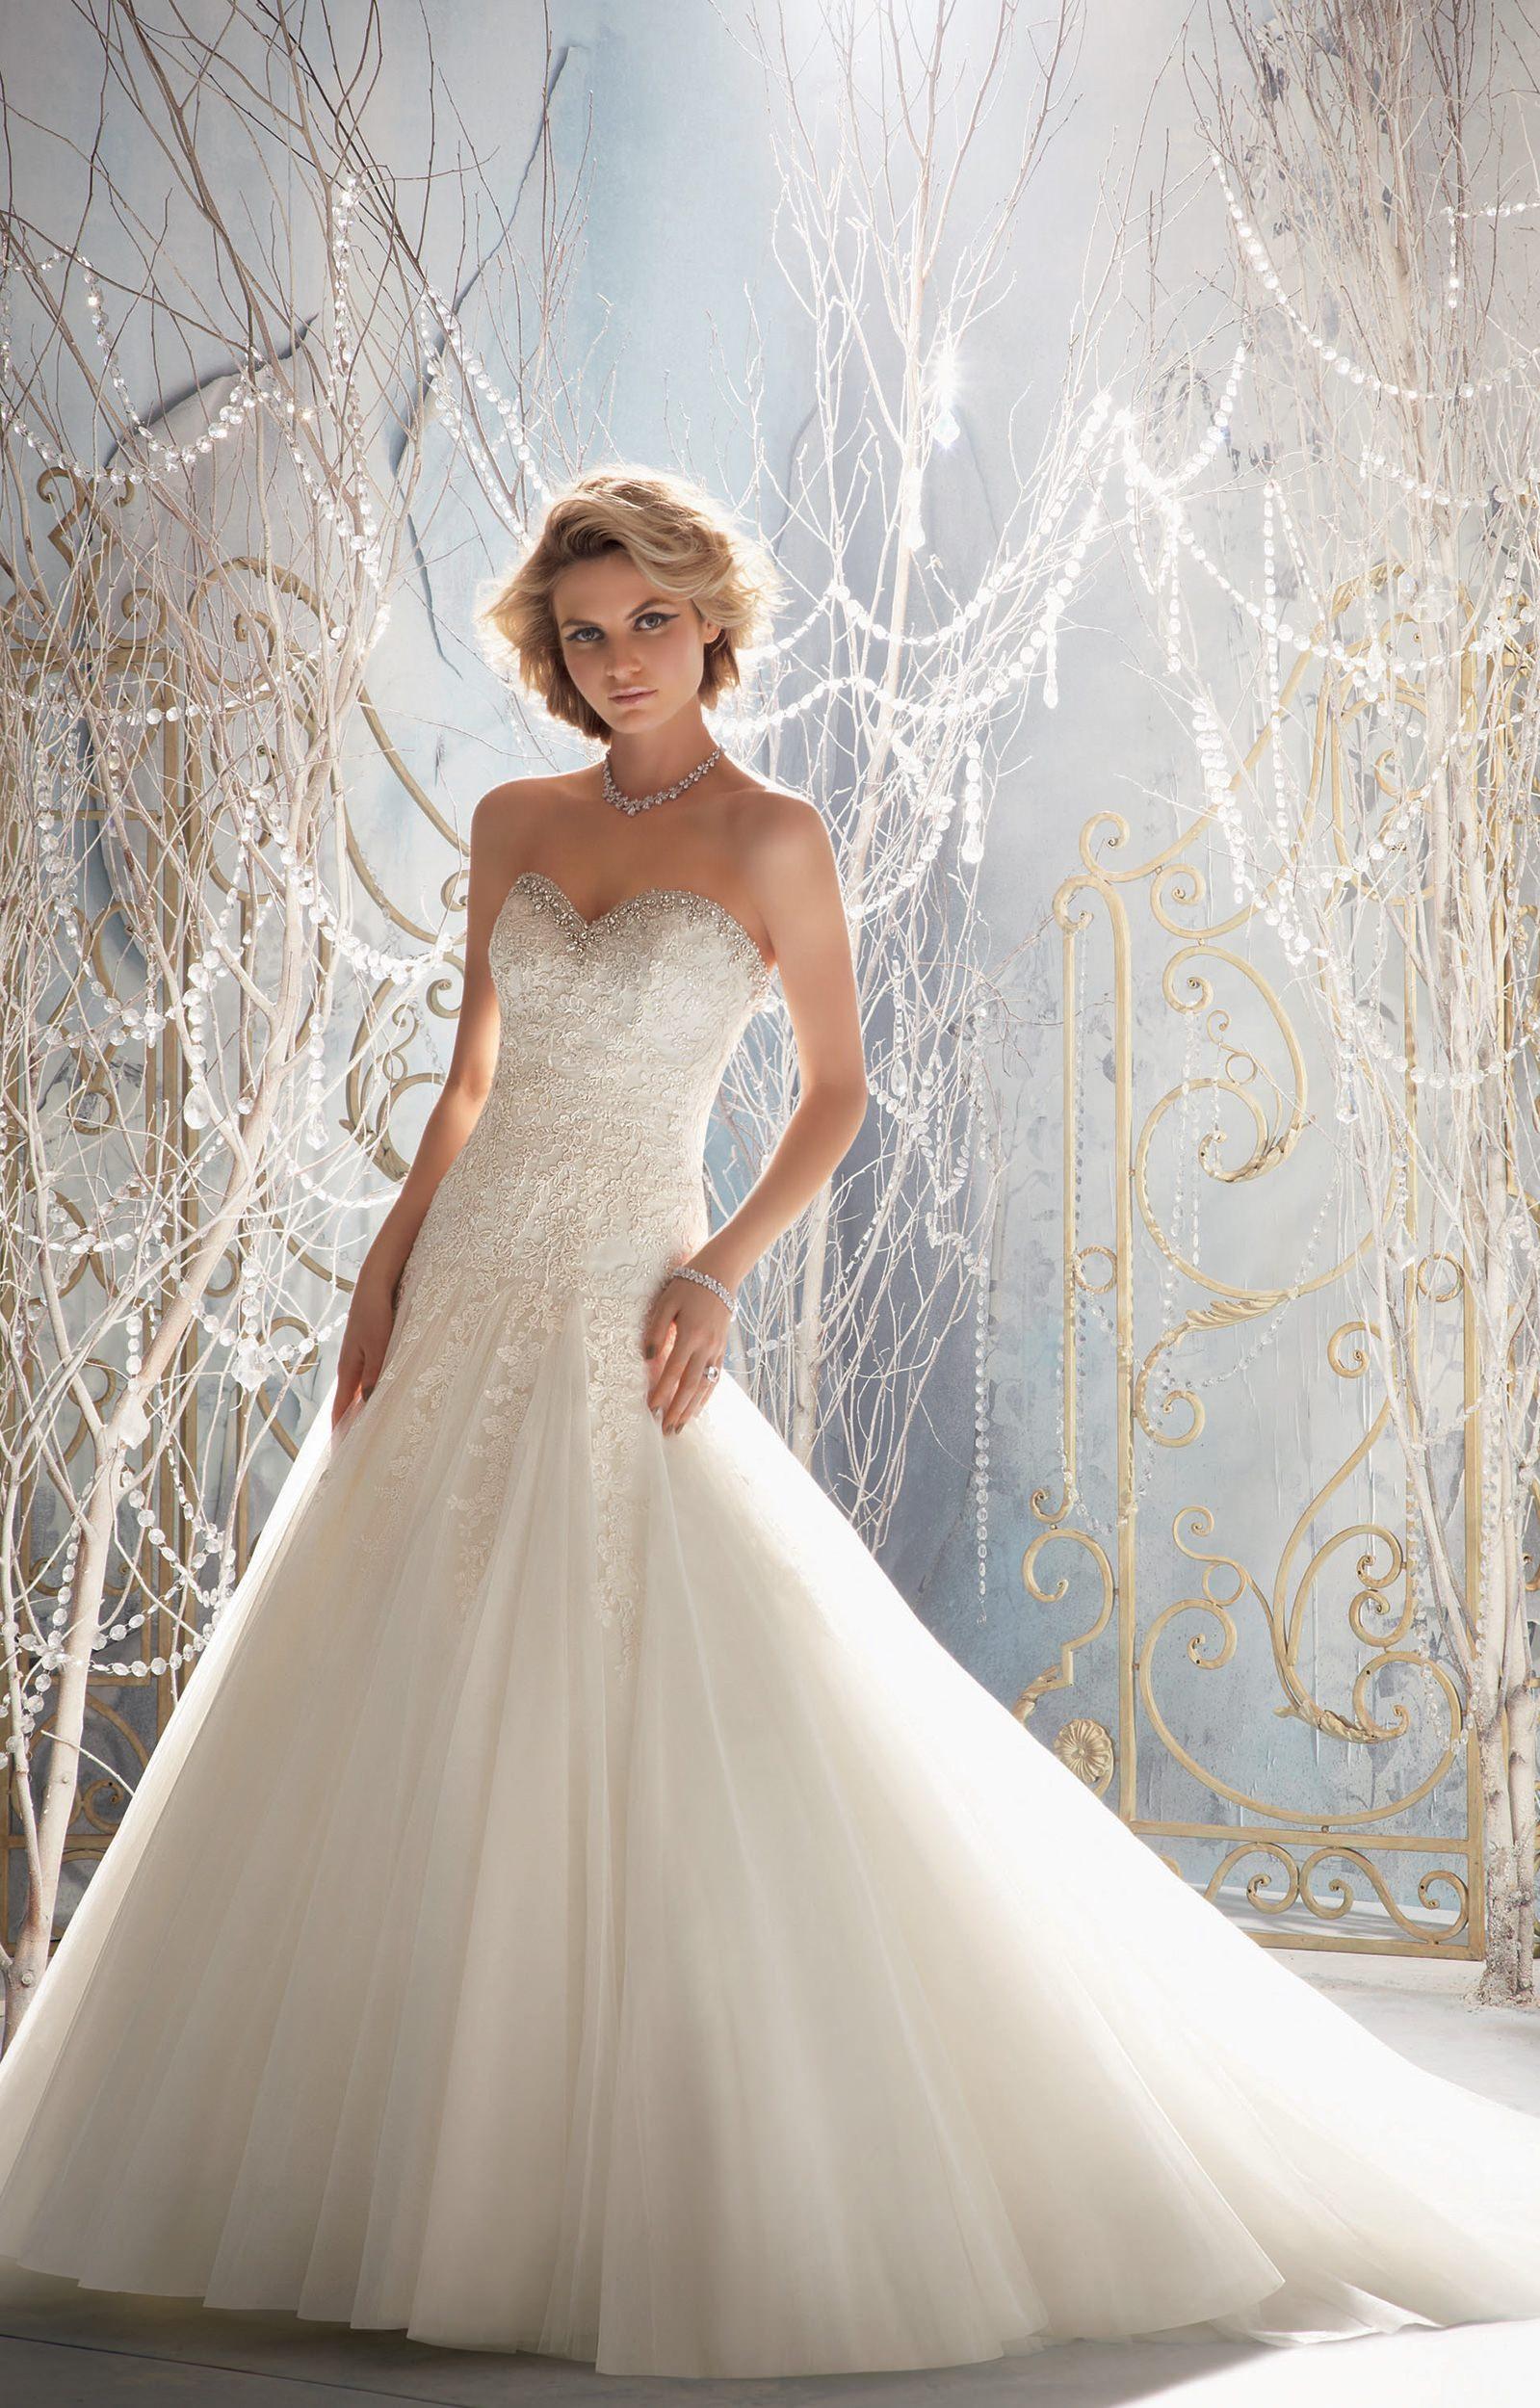 Mori lee bridal 1964 wedding dress